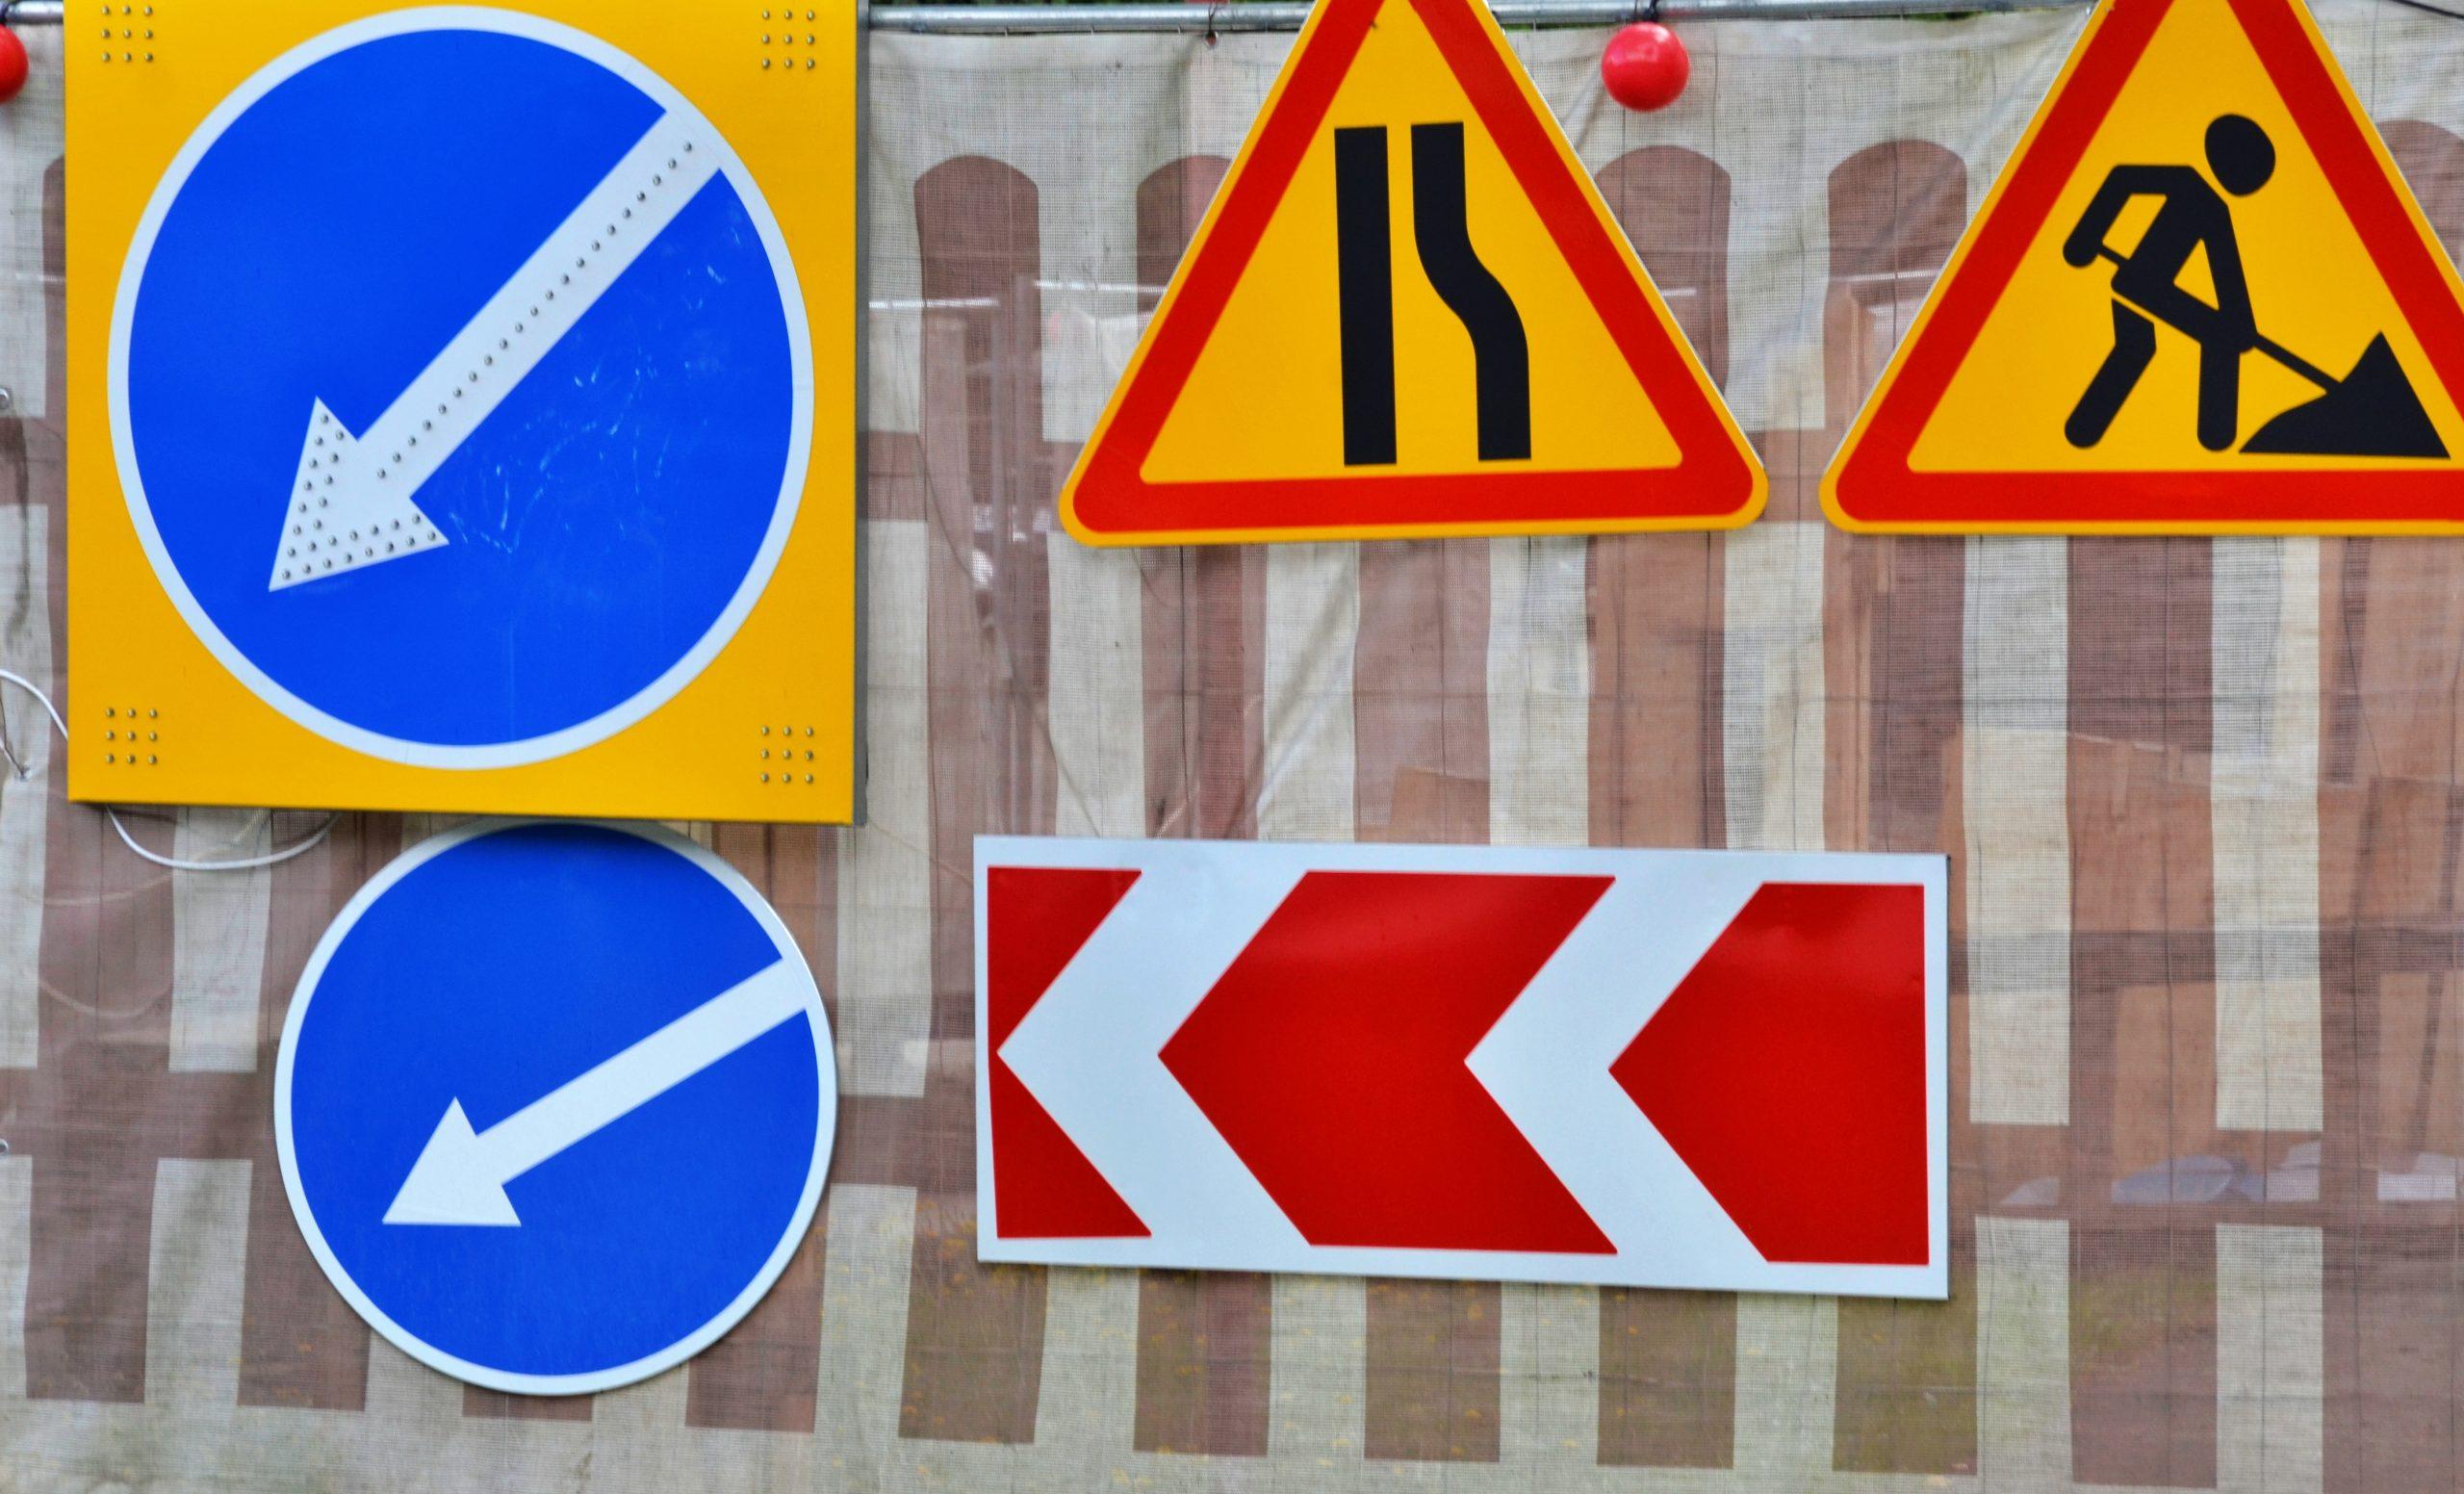 Ночное движение на проспекте Андропова ограничили до 25 апреля